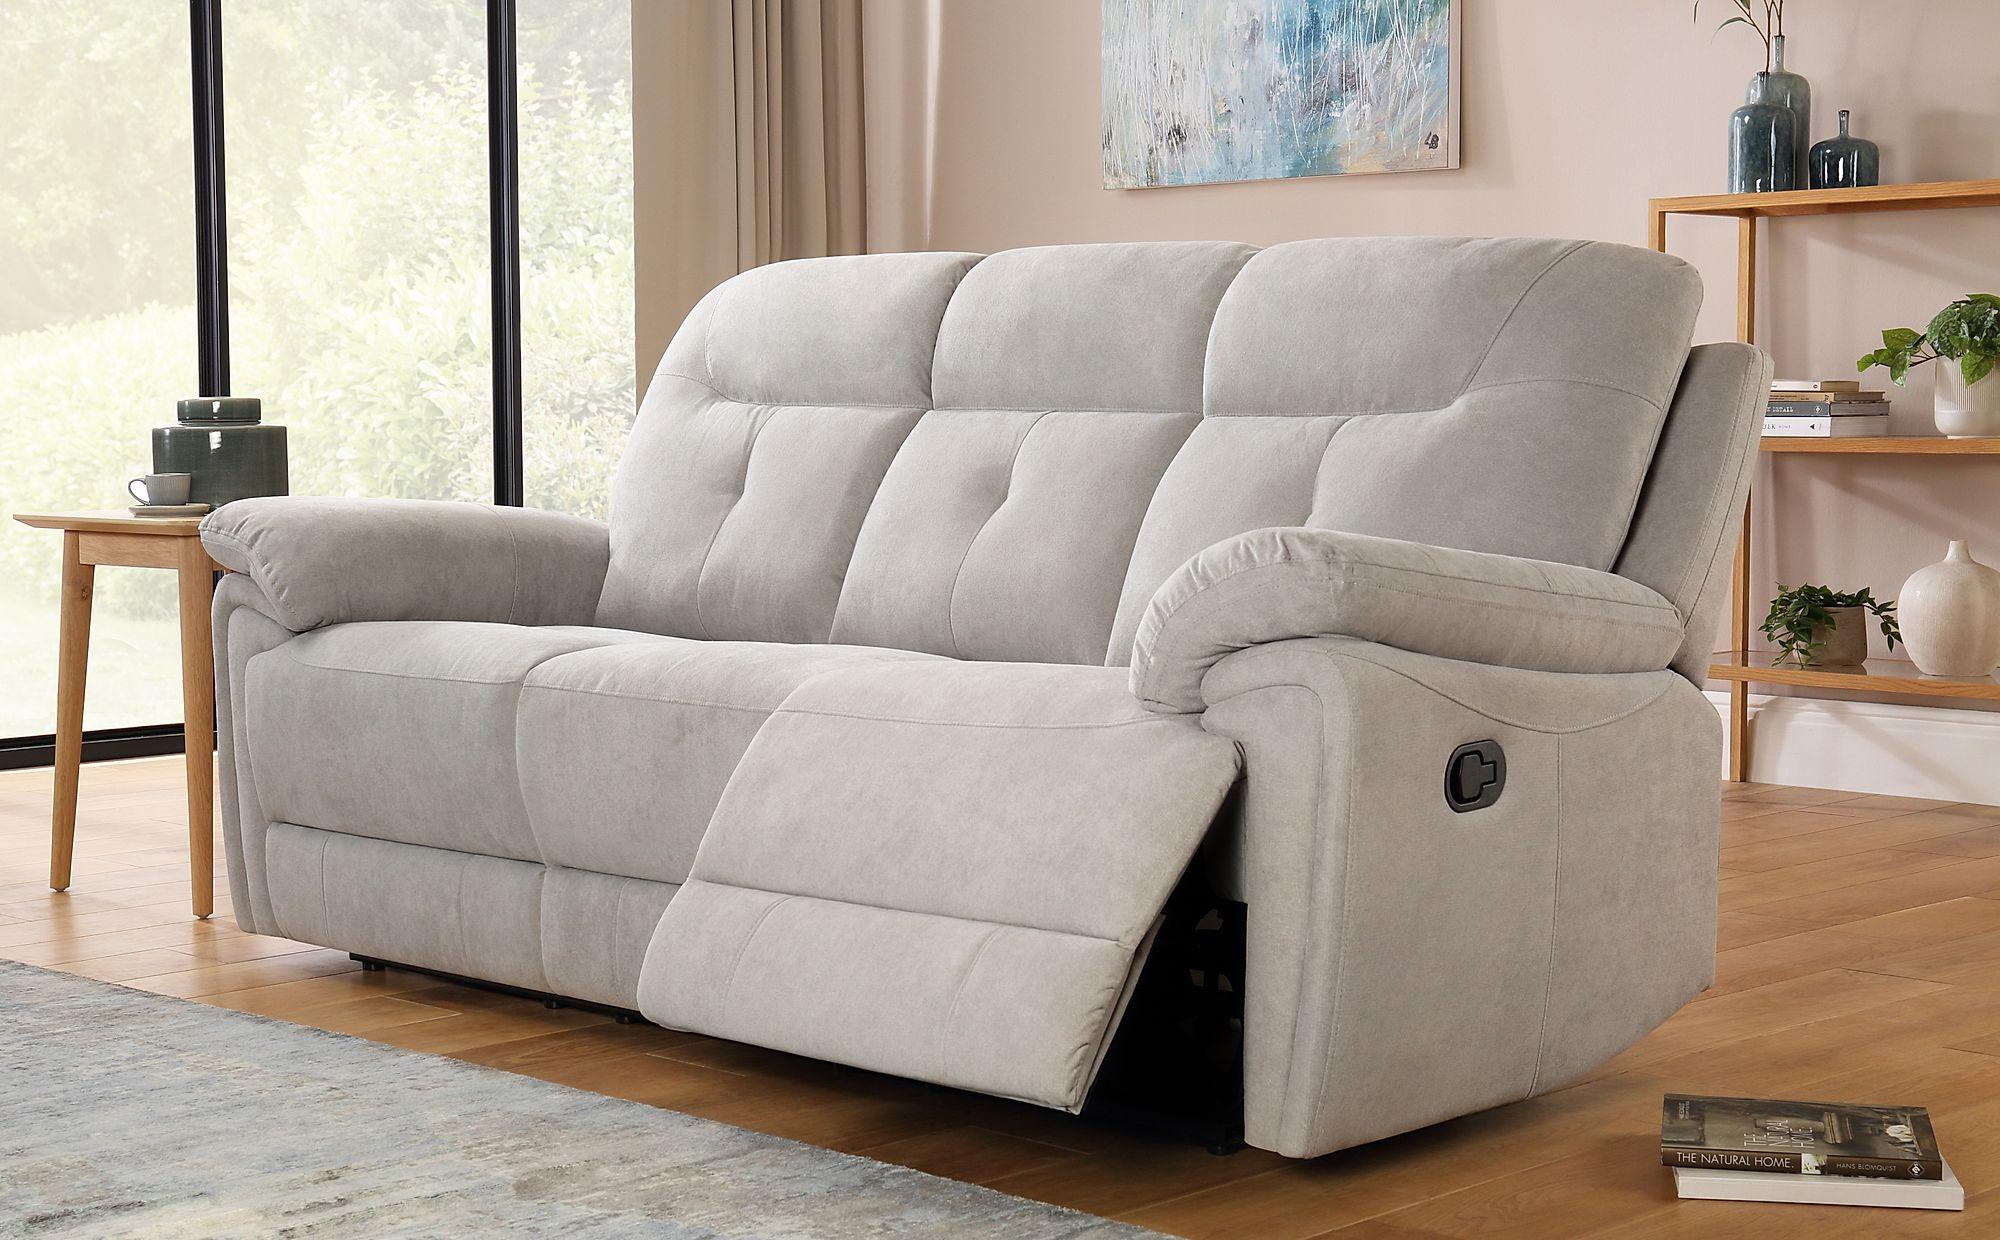 Ellington Dove Grey Plush Fabric 3 Seater Recliner Sofa ...